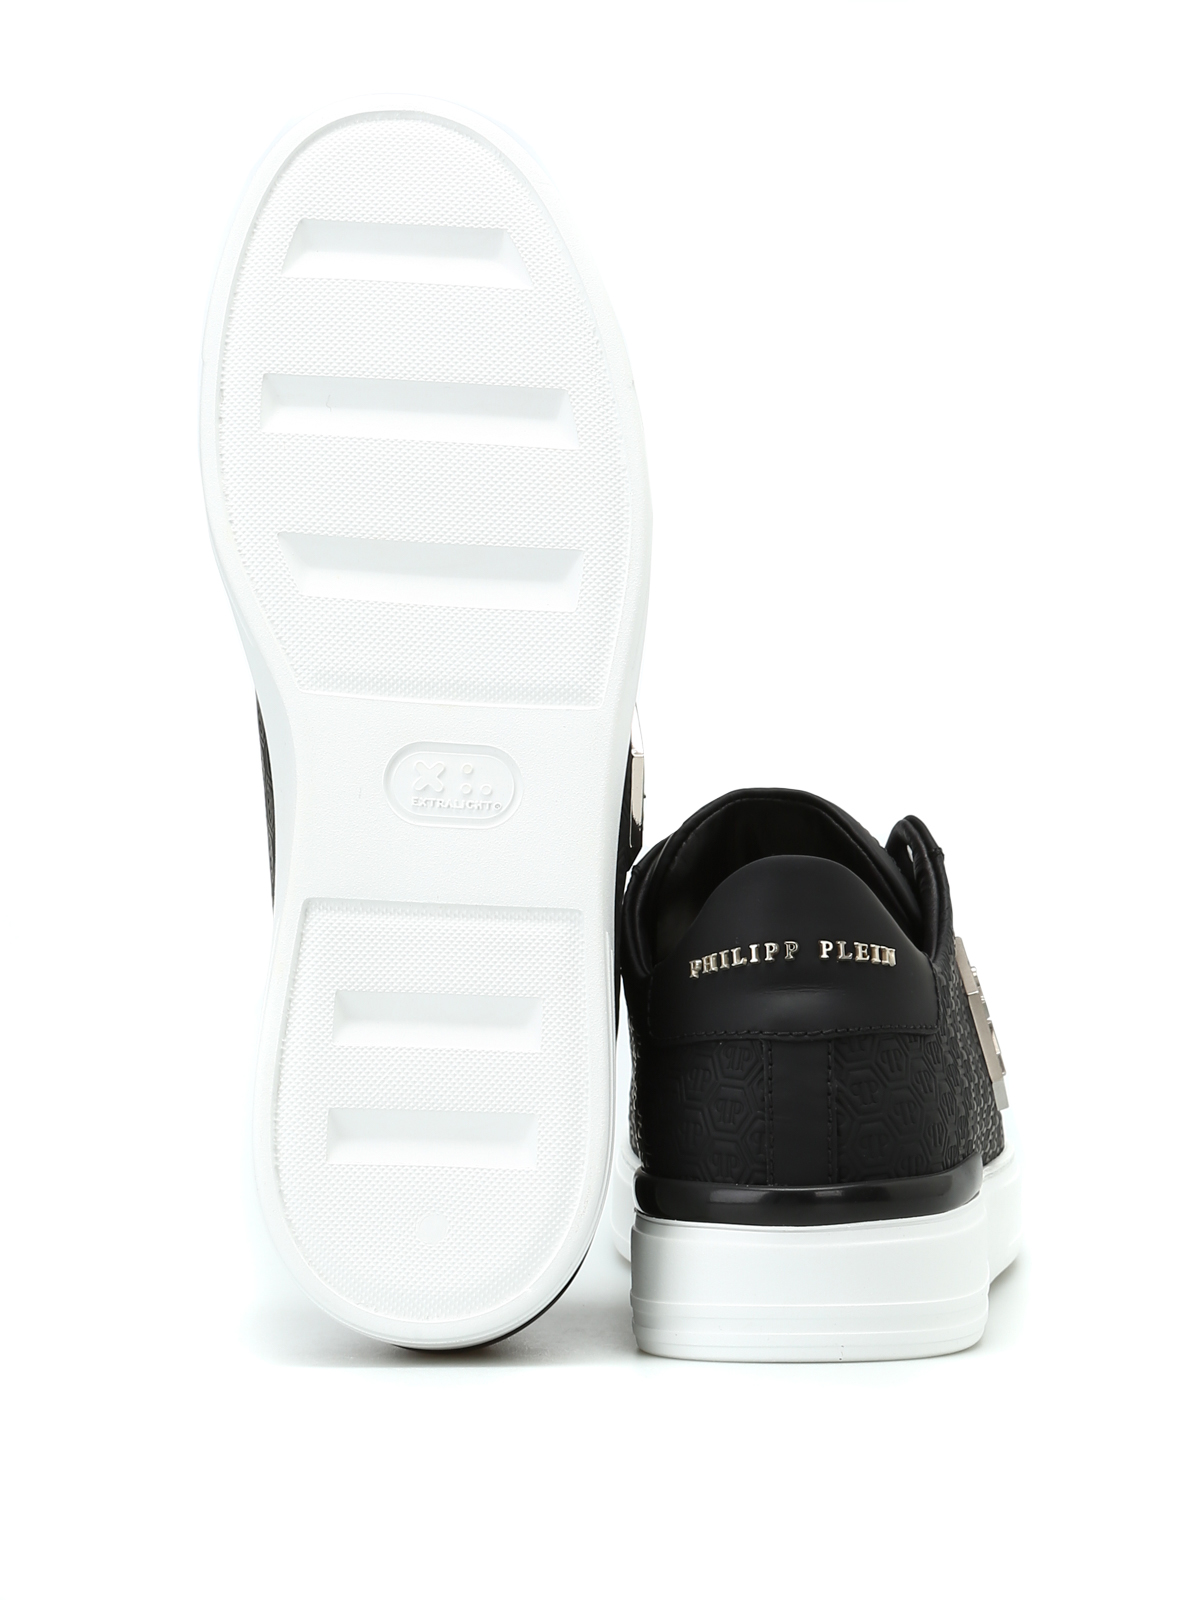 d4341c9b77d philipp-plein-buy-online-ebony-black-leather-sneakers-00000120136f00s015.jpg